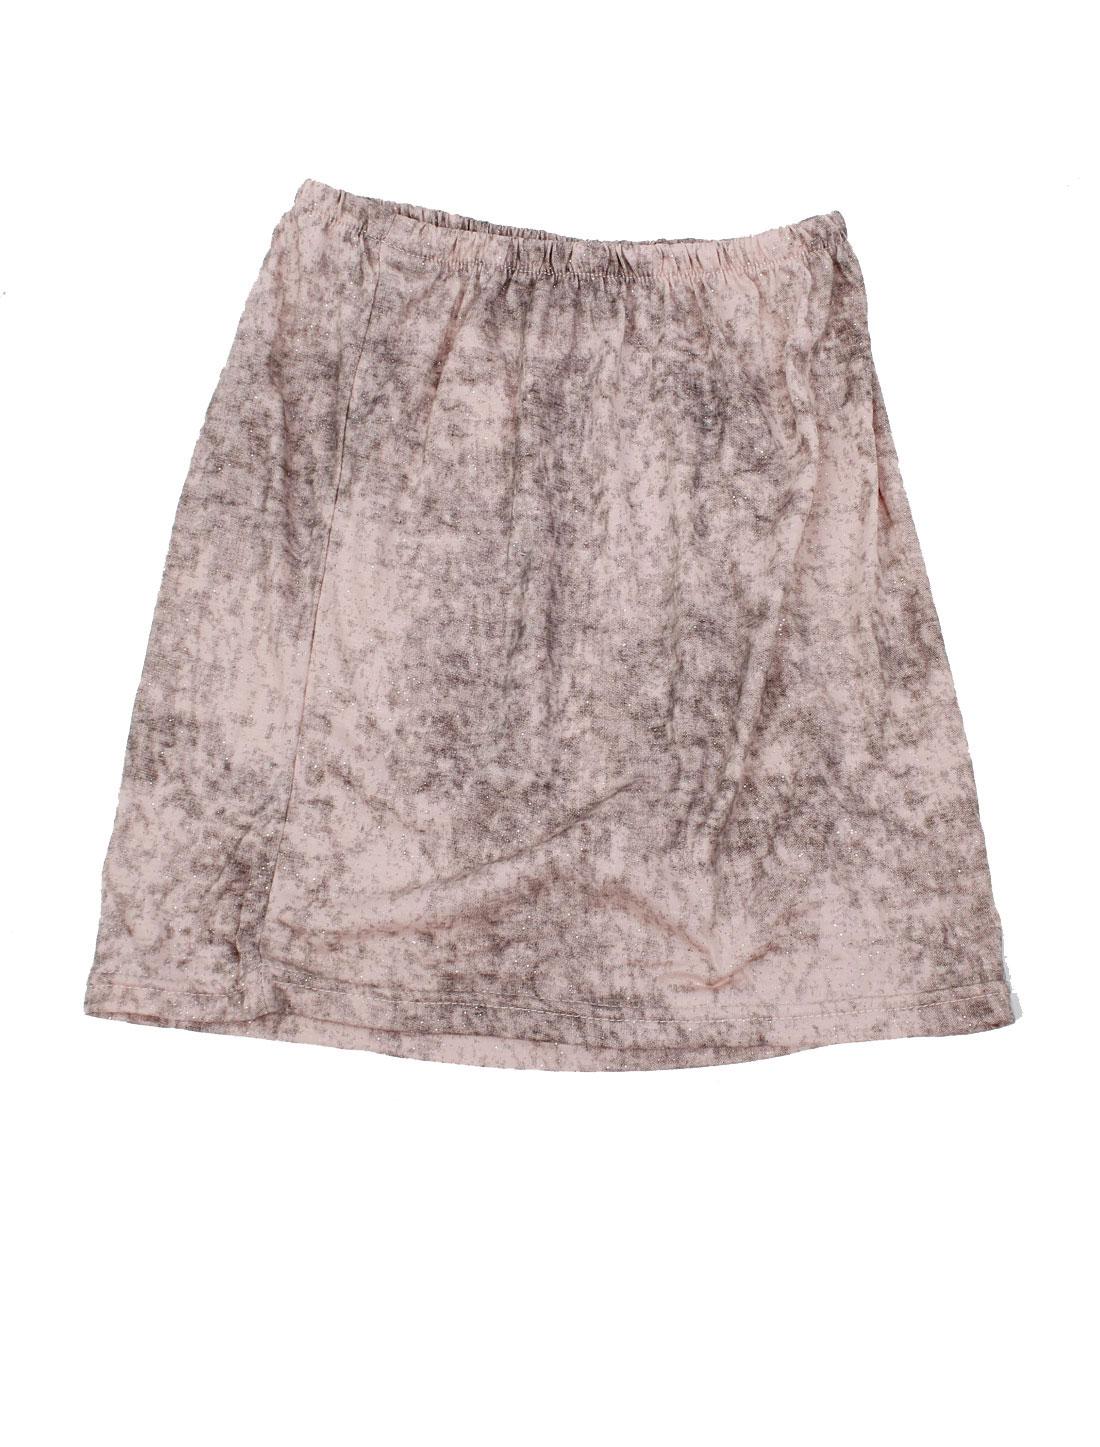 Ladies Elastic Waistline Close-Fitting Straight Mini Skirt Pink XS